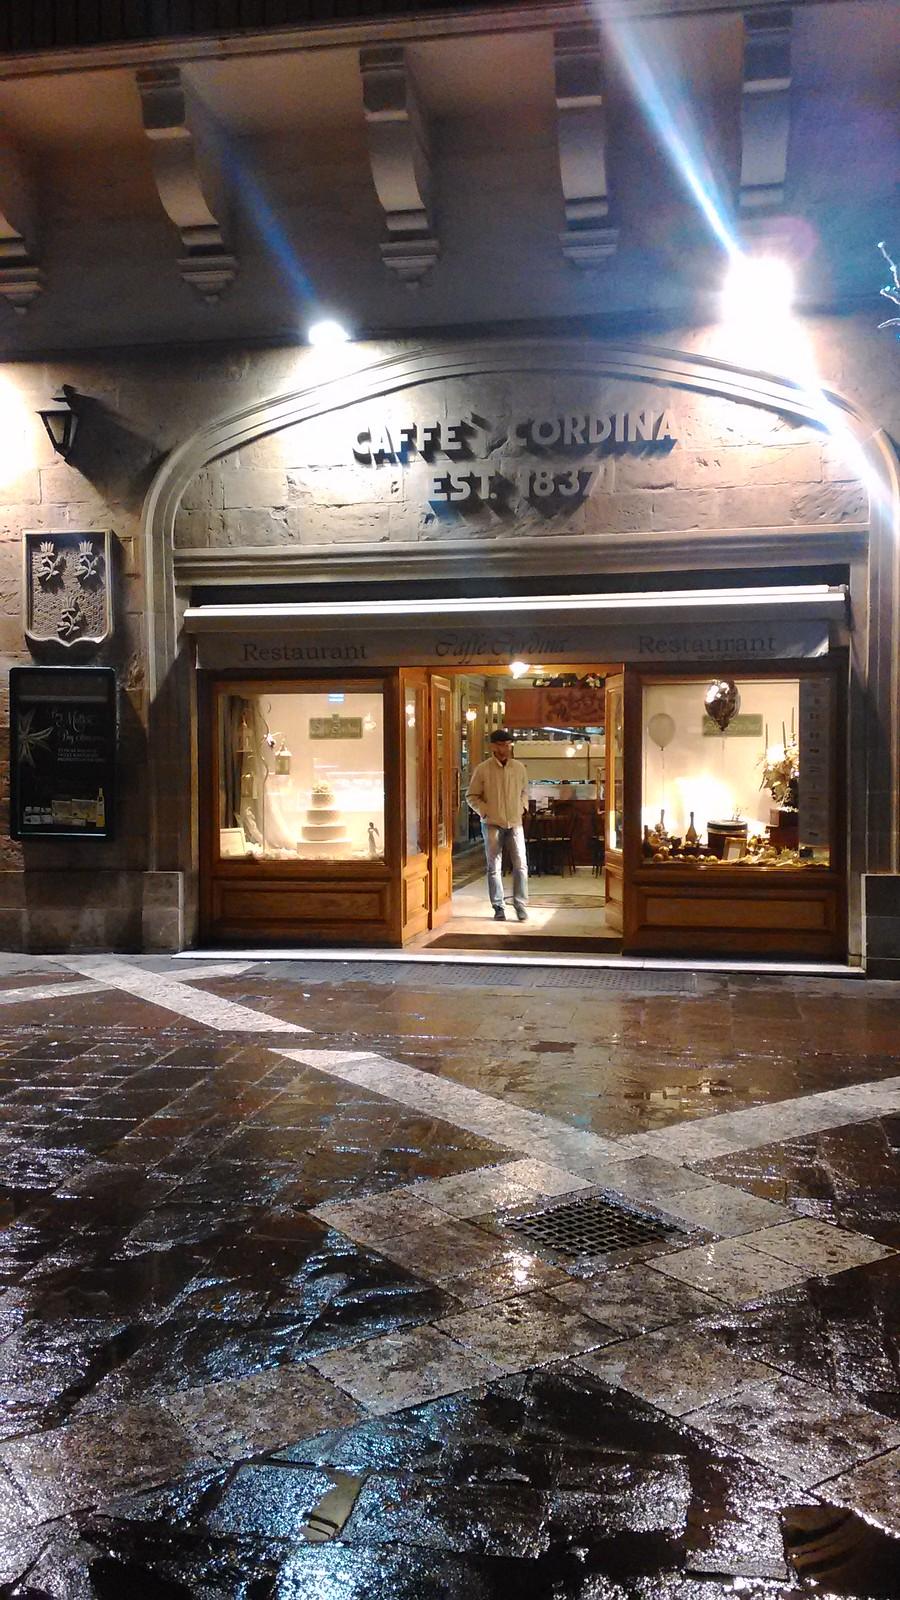 Caffé Cordina - Valletta Republic Street